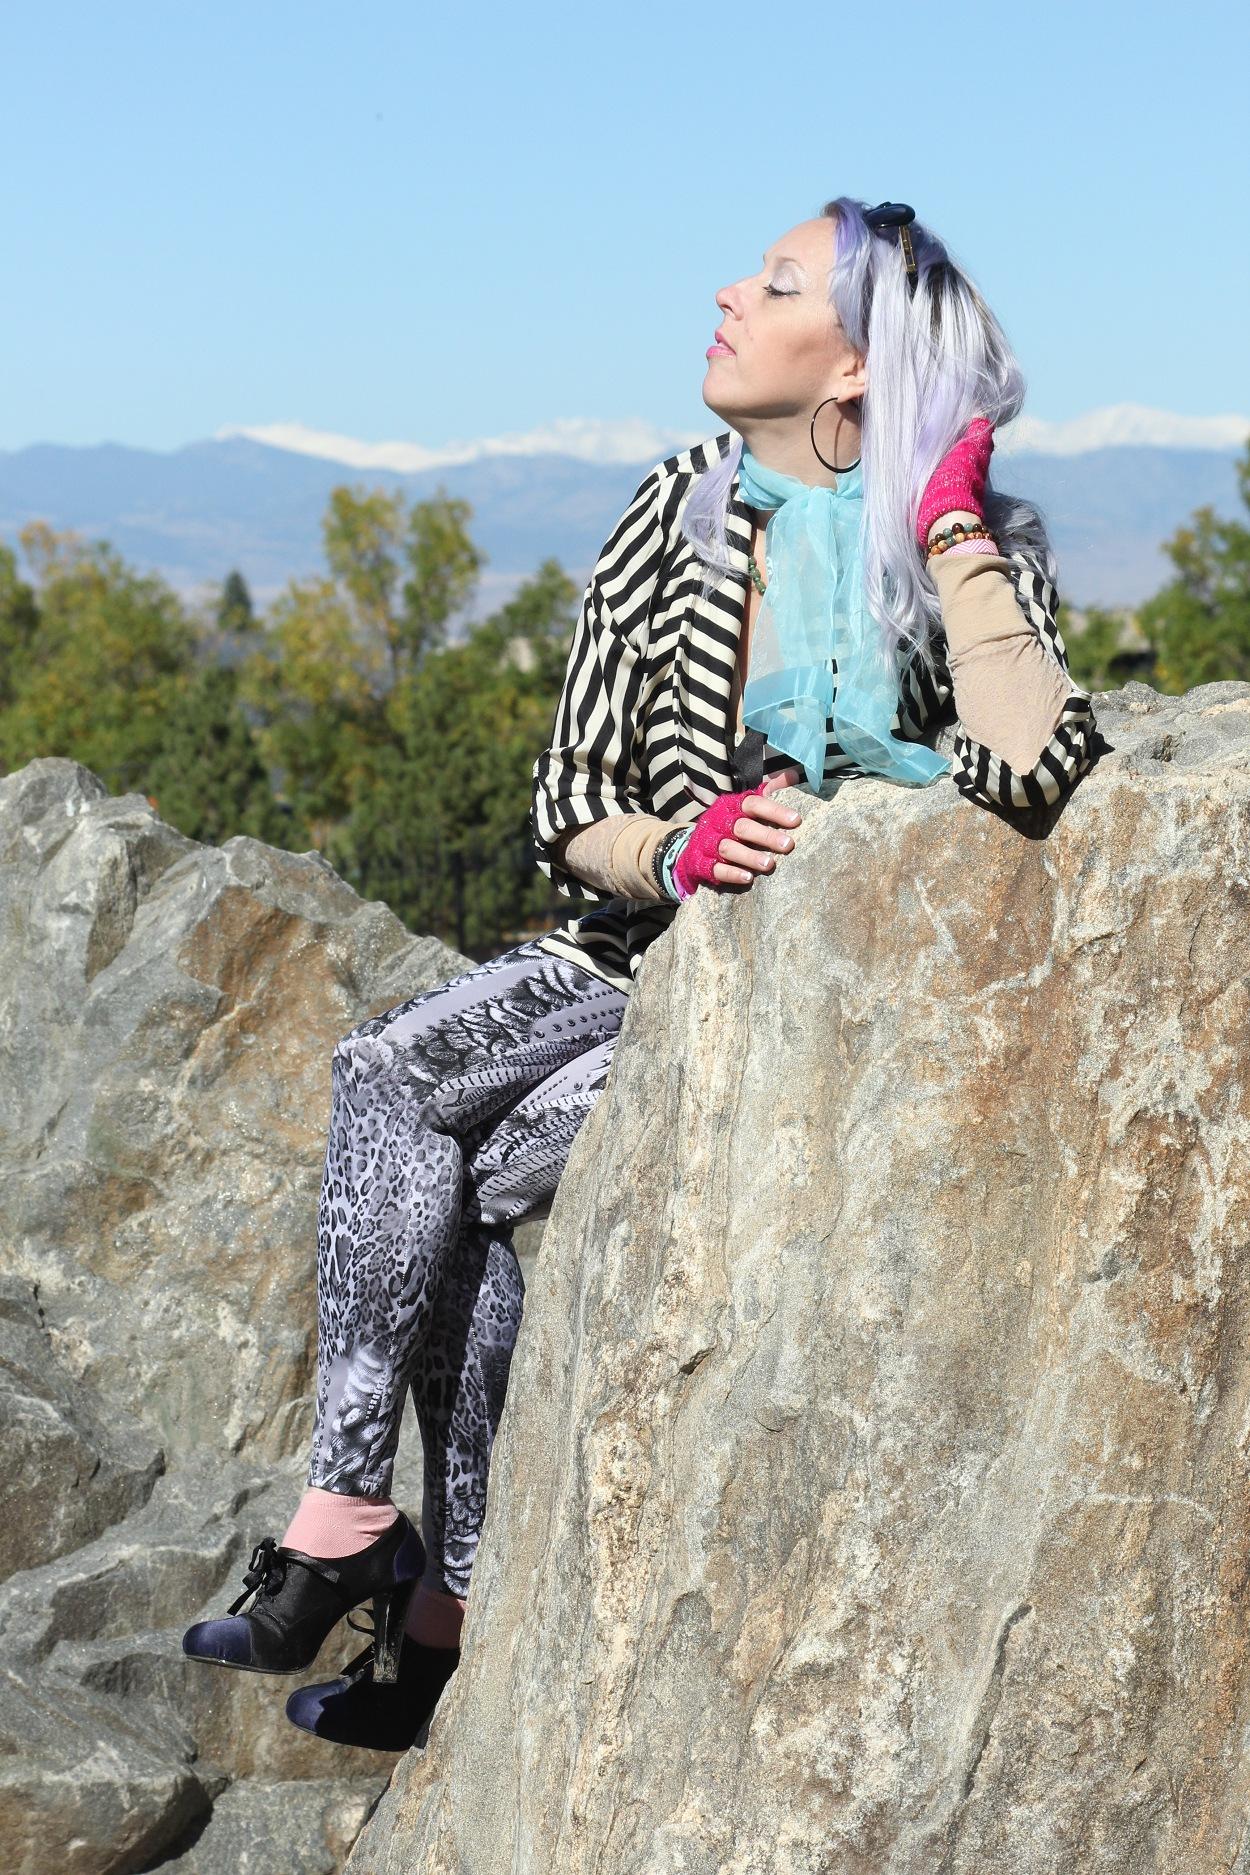 Colorado Glamour Girl by trishatrixie